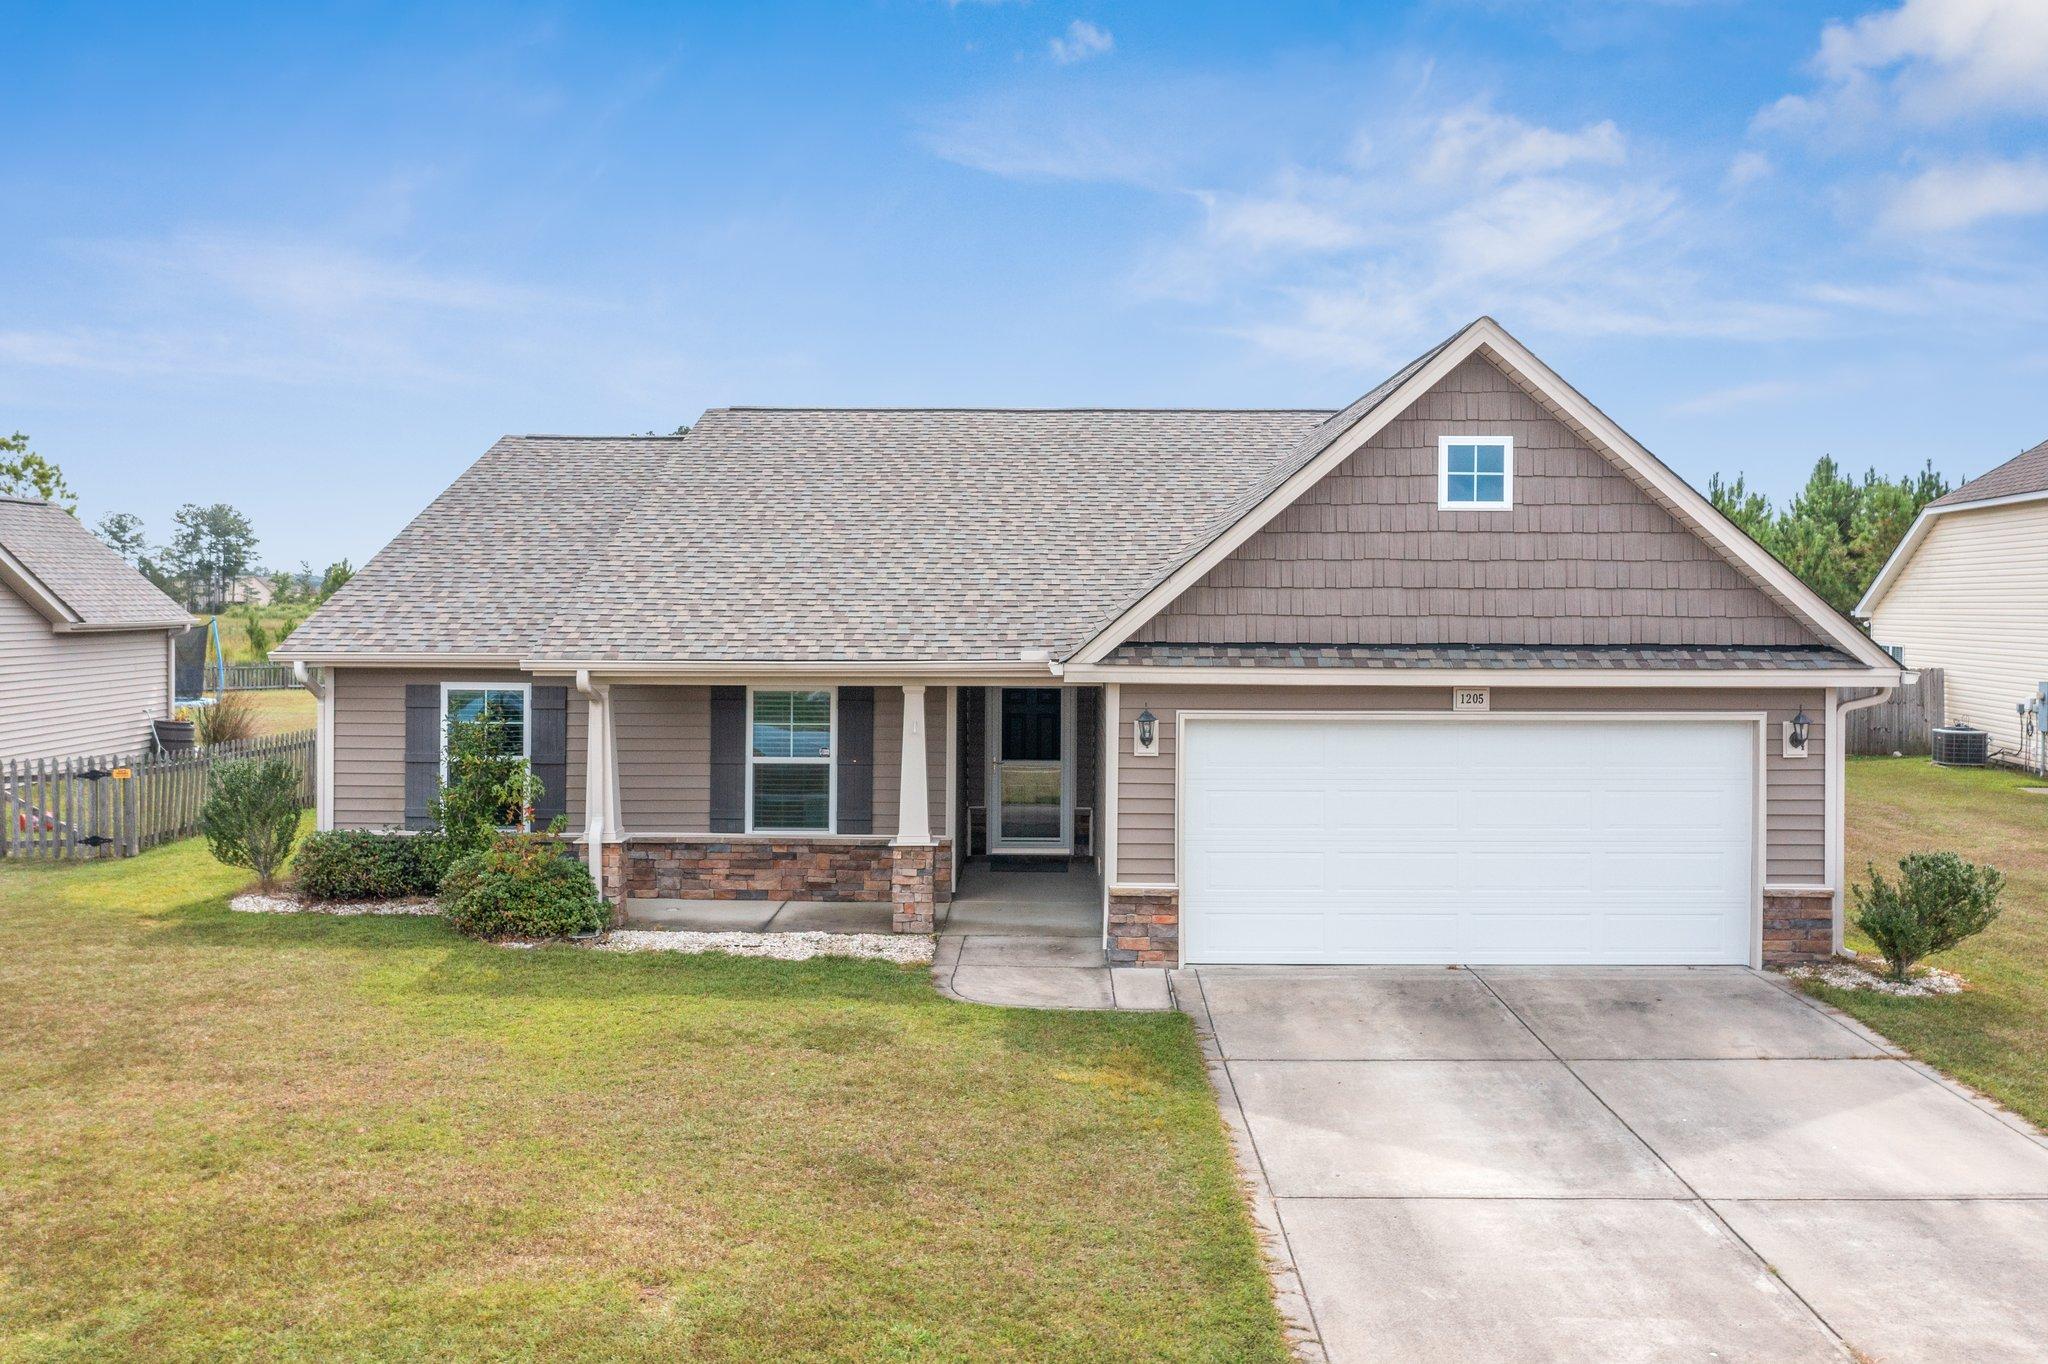 1205 Teakwood Dr, Greenville, NC 27834, USA